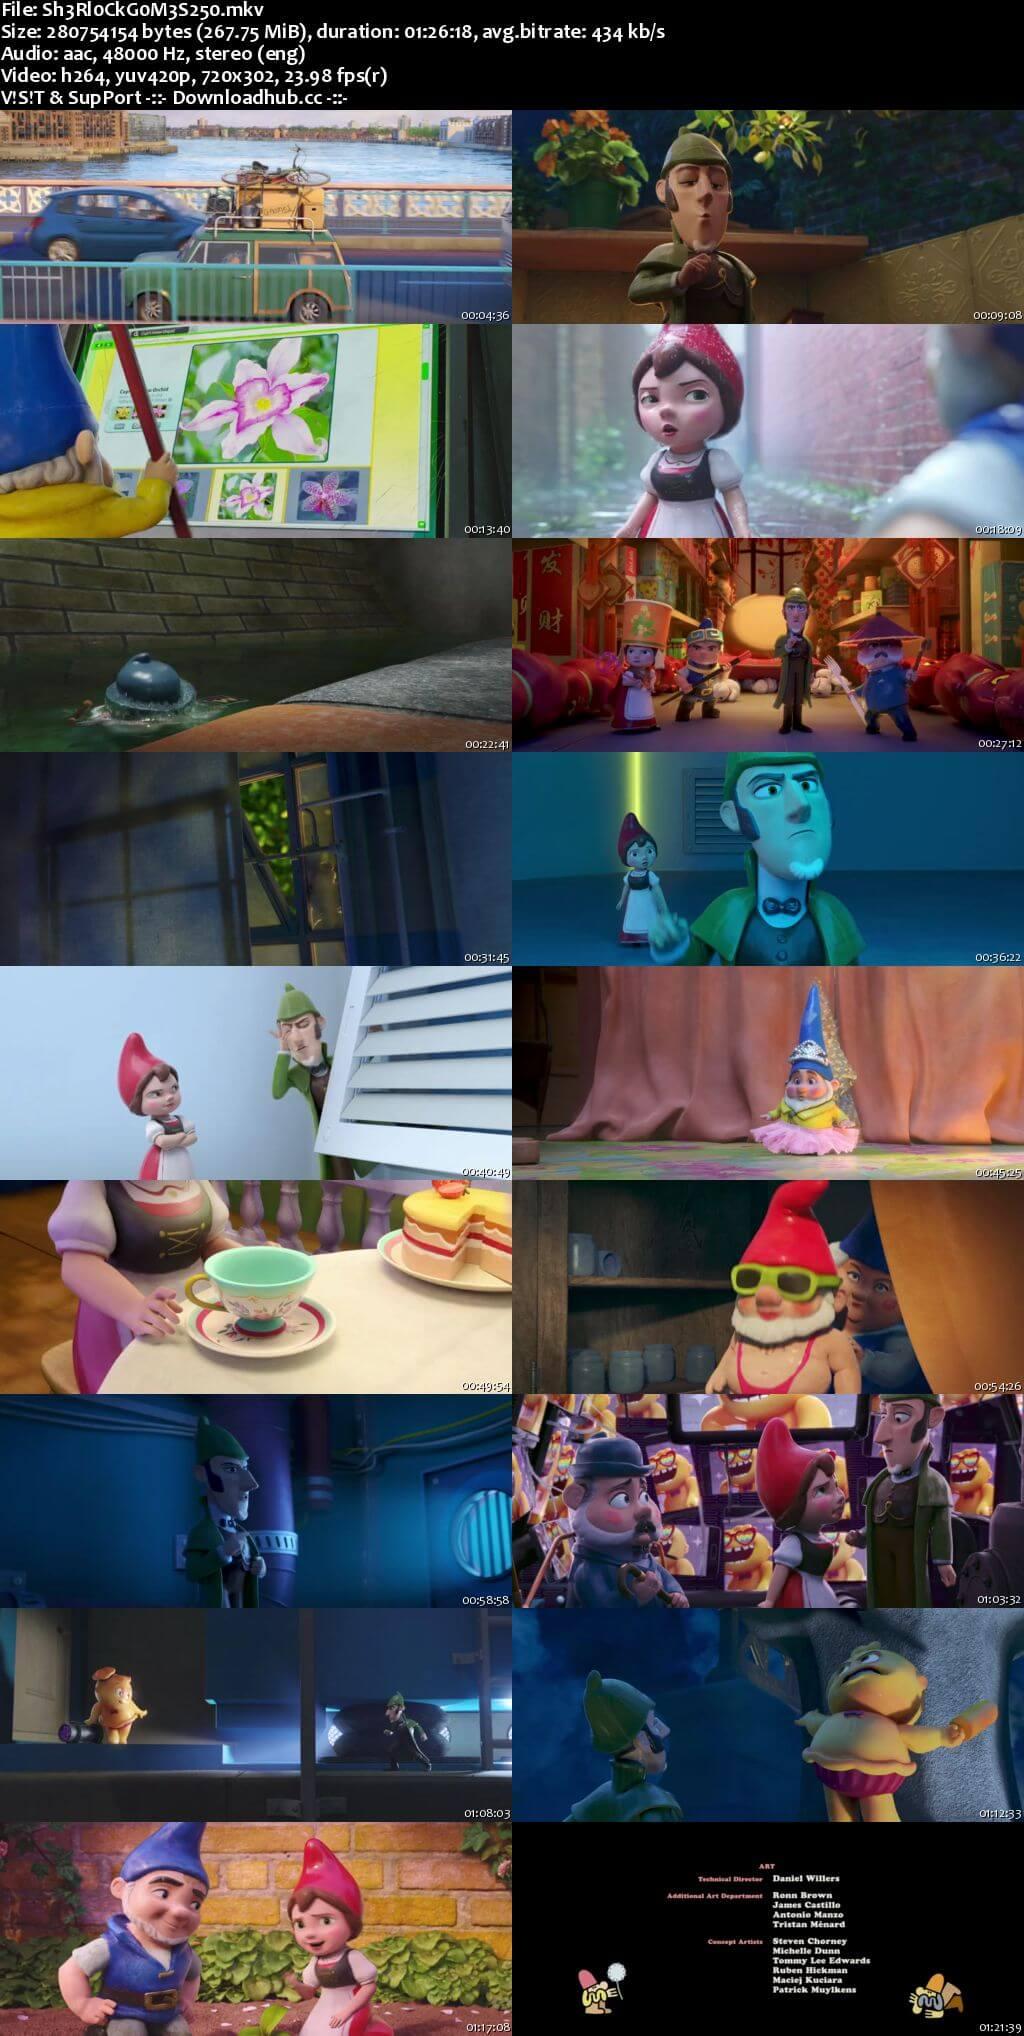 Sherlock Gnomes 2018 English 480p BRRip ESubs